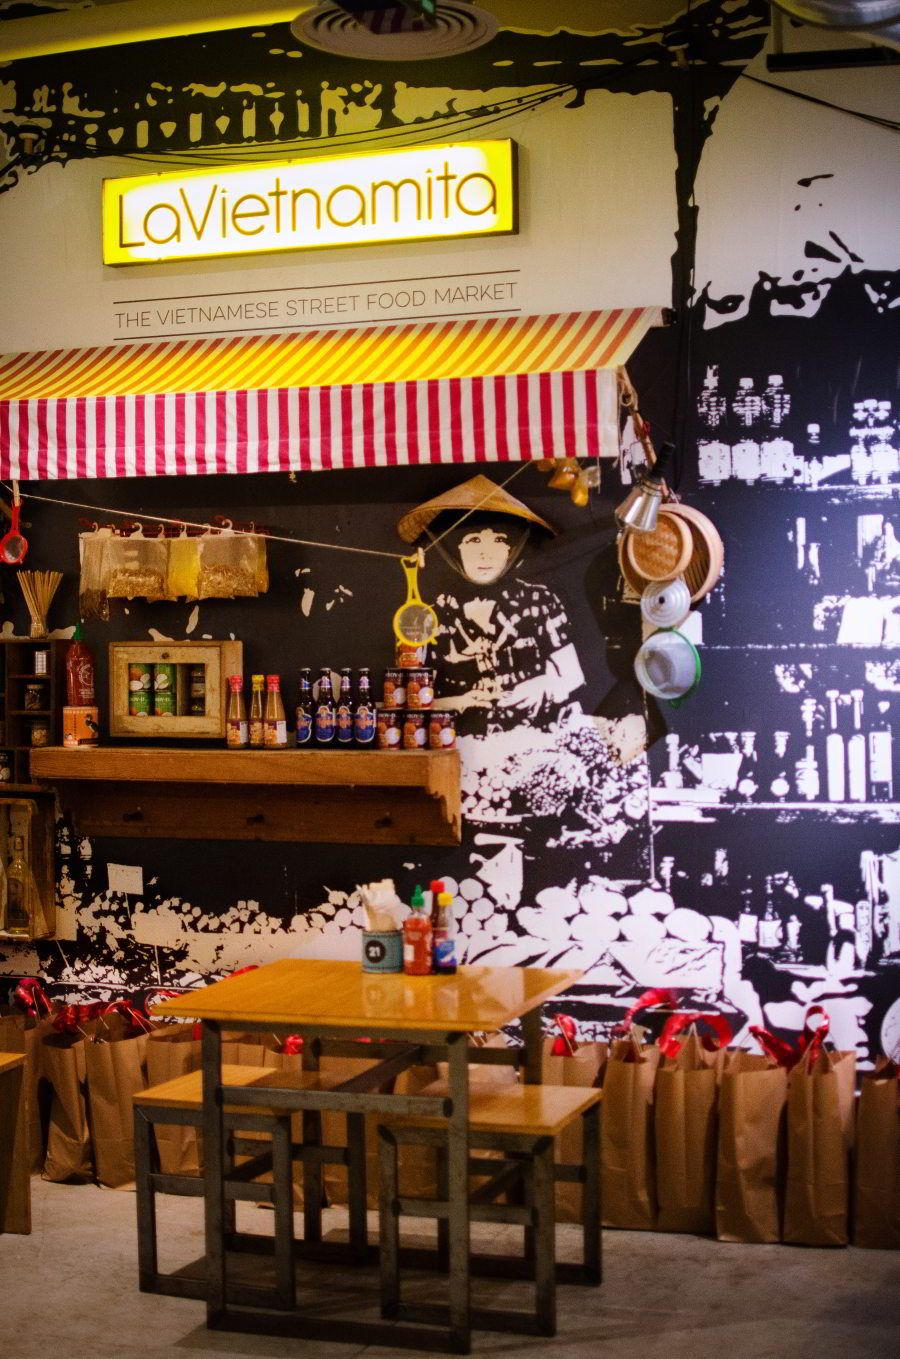 La Vietnamita Sant Antoni Best Vietnamese Restaurant In Barcelona Vietnamese Restaurant Vietnamese Street Food Street Food Market